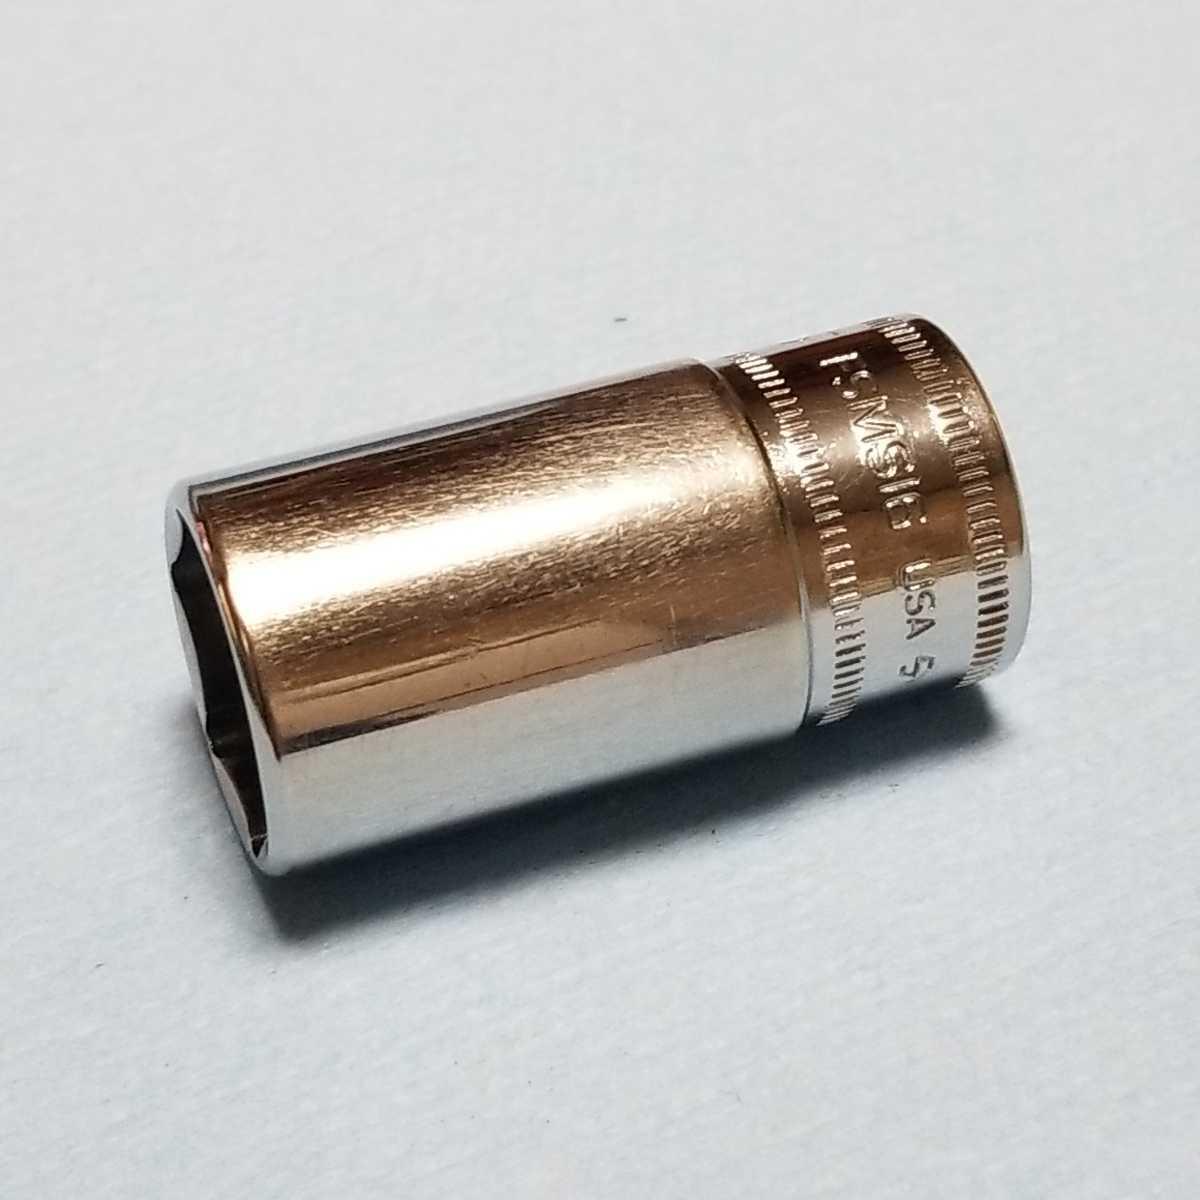 16mm 3/8 セミディープ スナップオン FSMS16 (6角) 中古品 美品 保管品 SNAPON SNAP-ON セミディープソケット ソケット 送料無料 _画像8